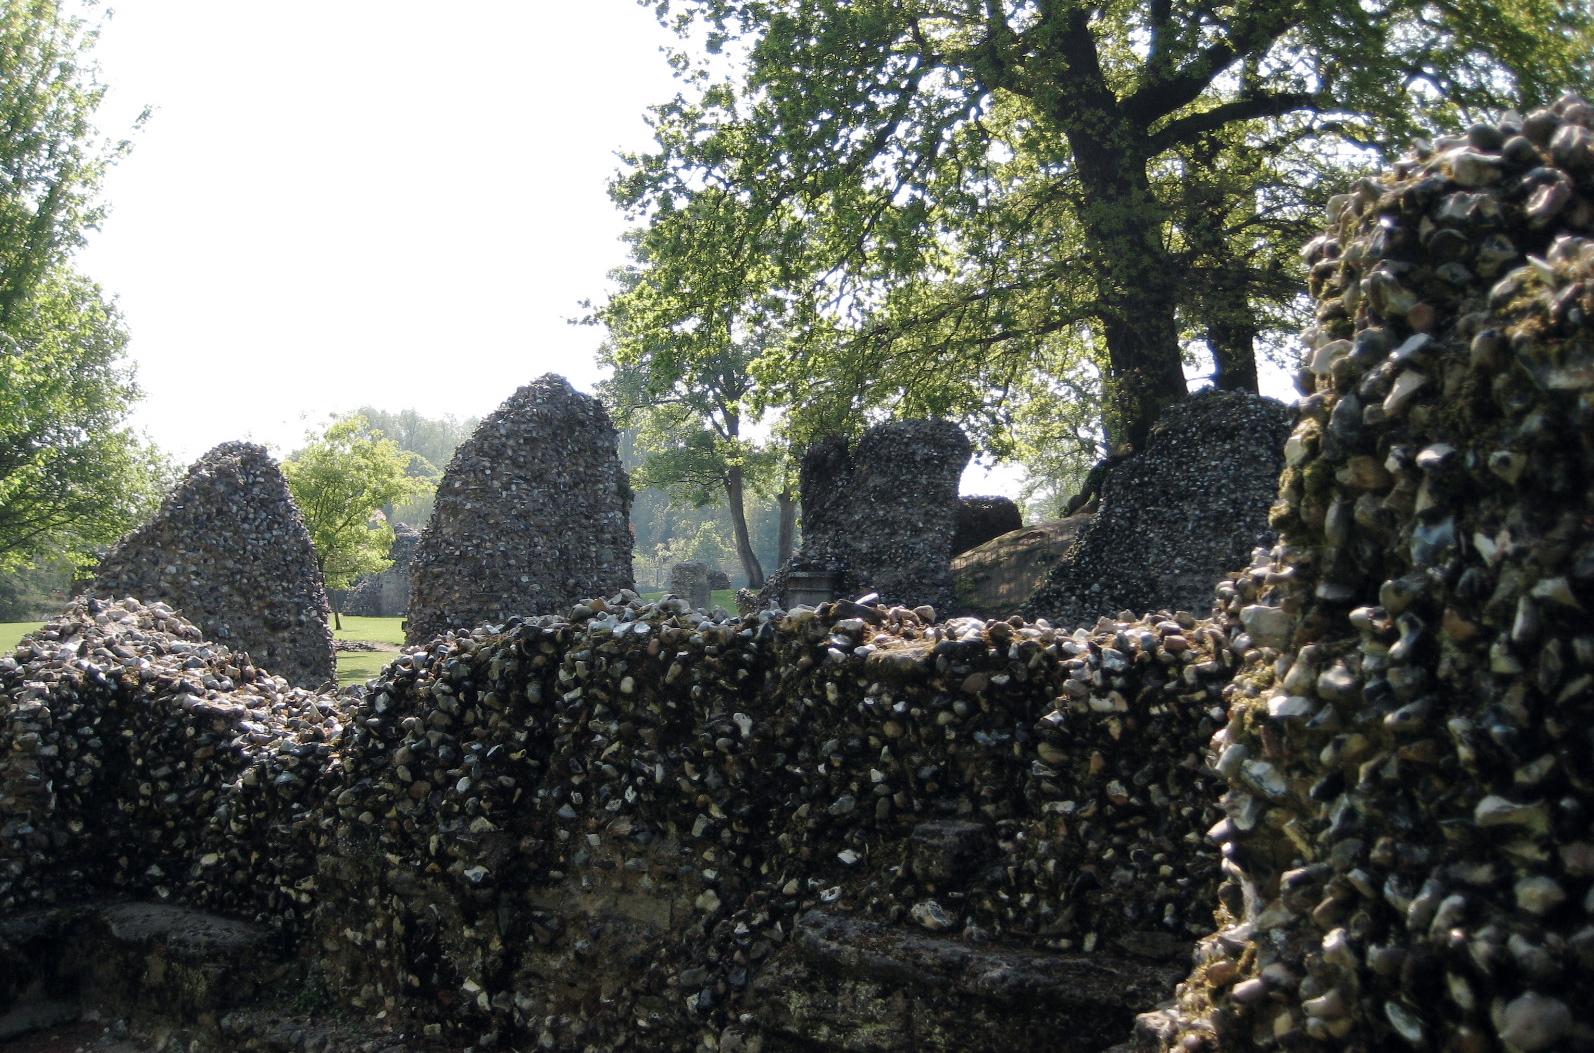 Abbey ruins at Bury St. Edmunds